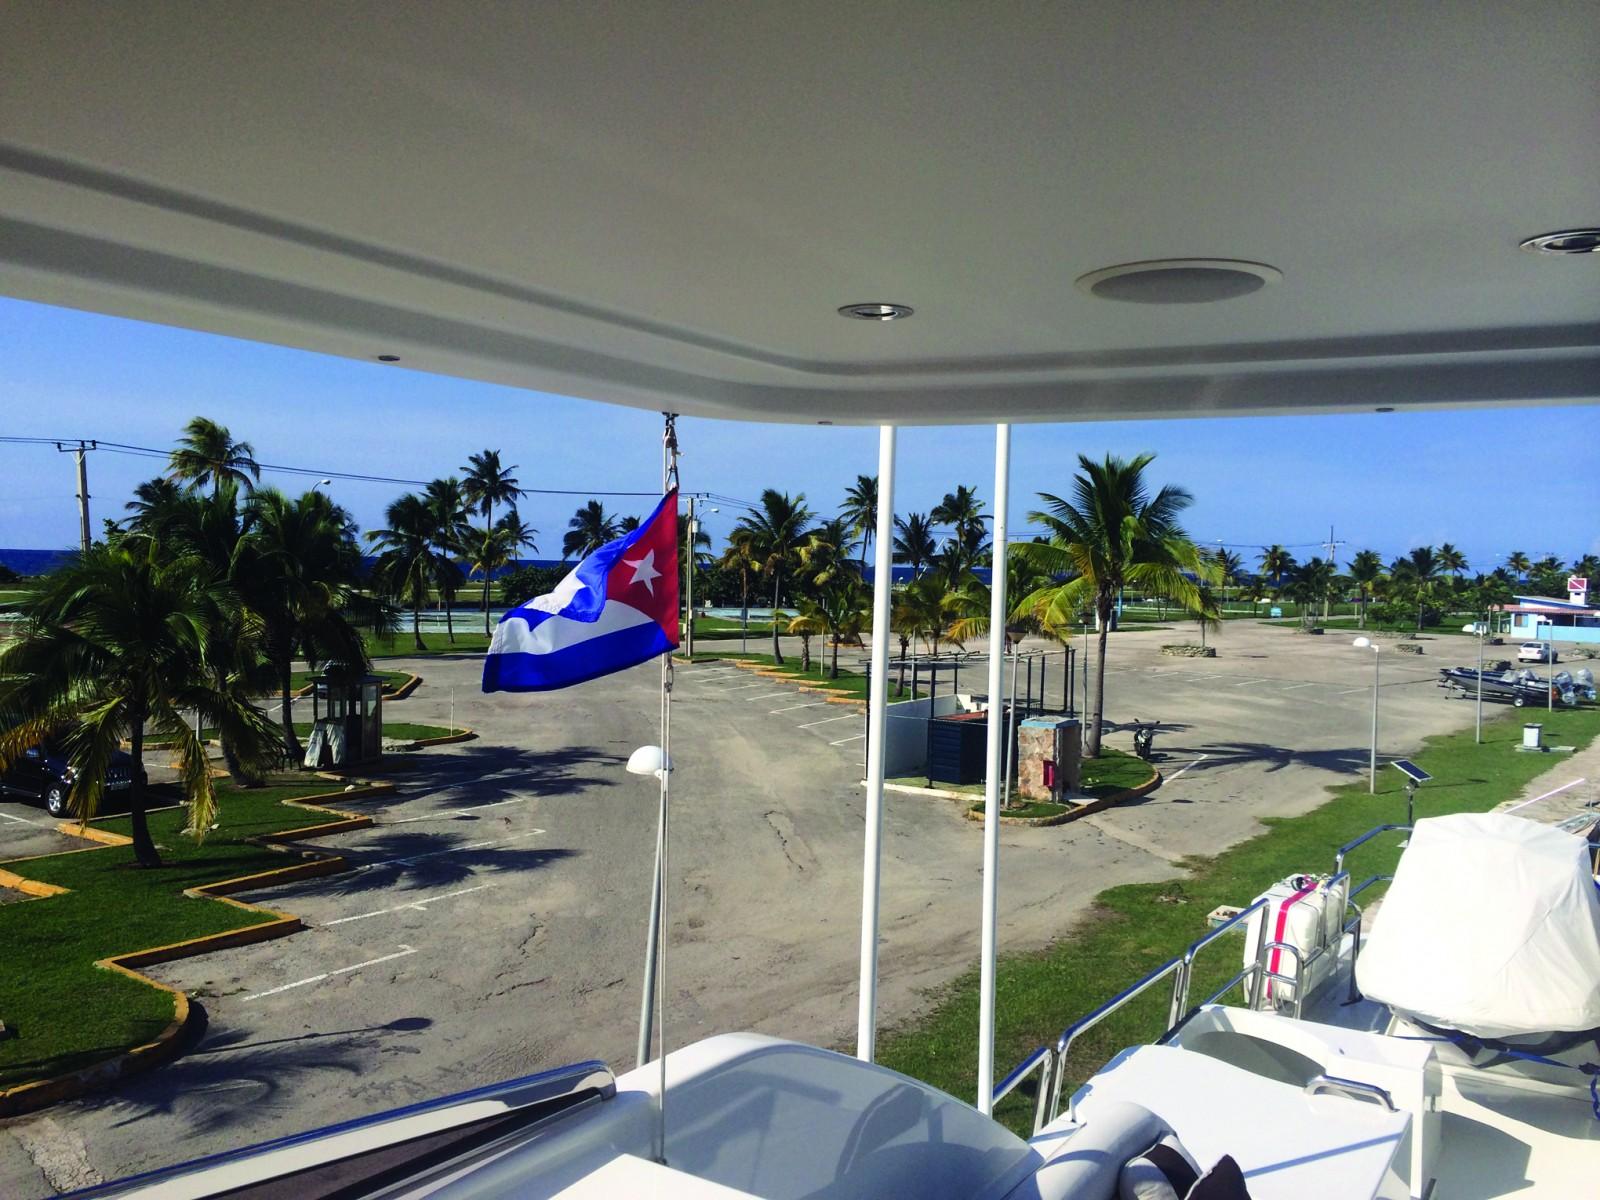 A1 CUBA MS 5951